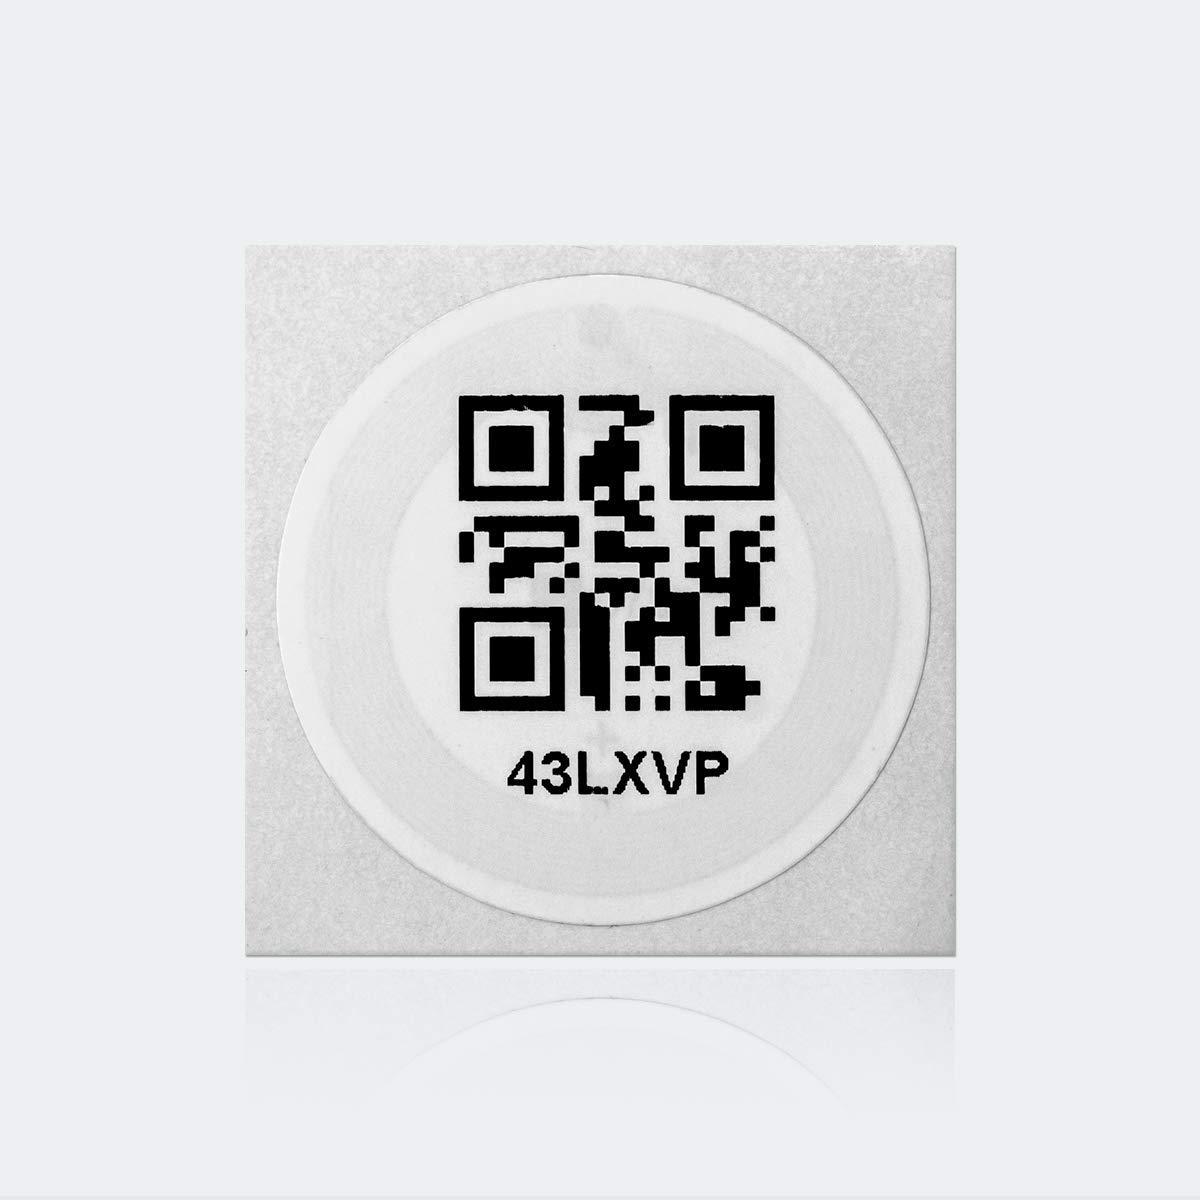 Ready Made ID Printed NFC Sticker 38 mm Circle iCode SLIX 10 Pack